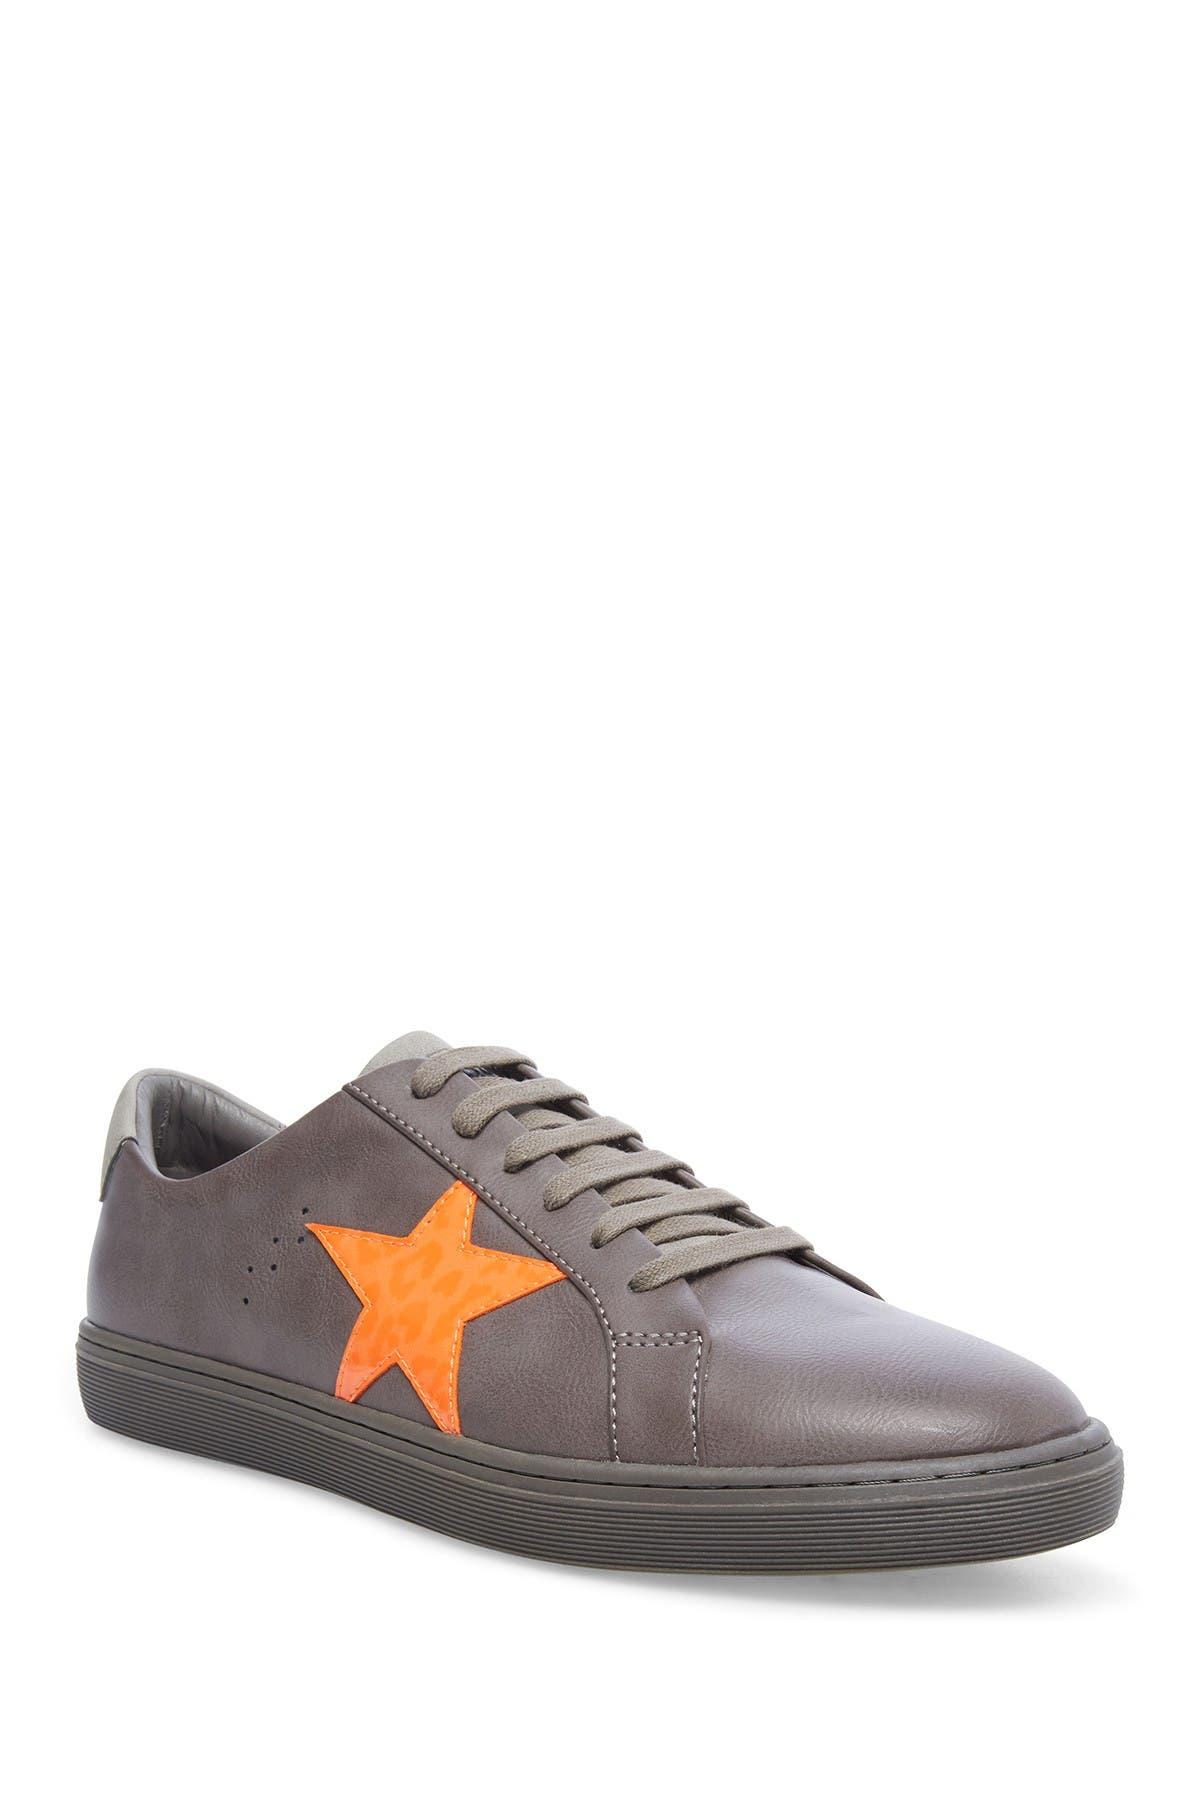 Image of Madden Danger Star Lace-Up Sneaker